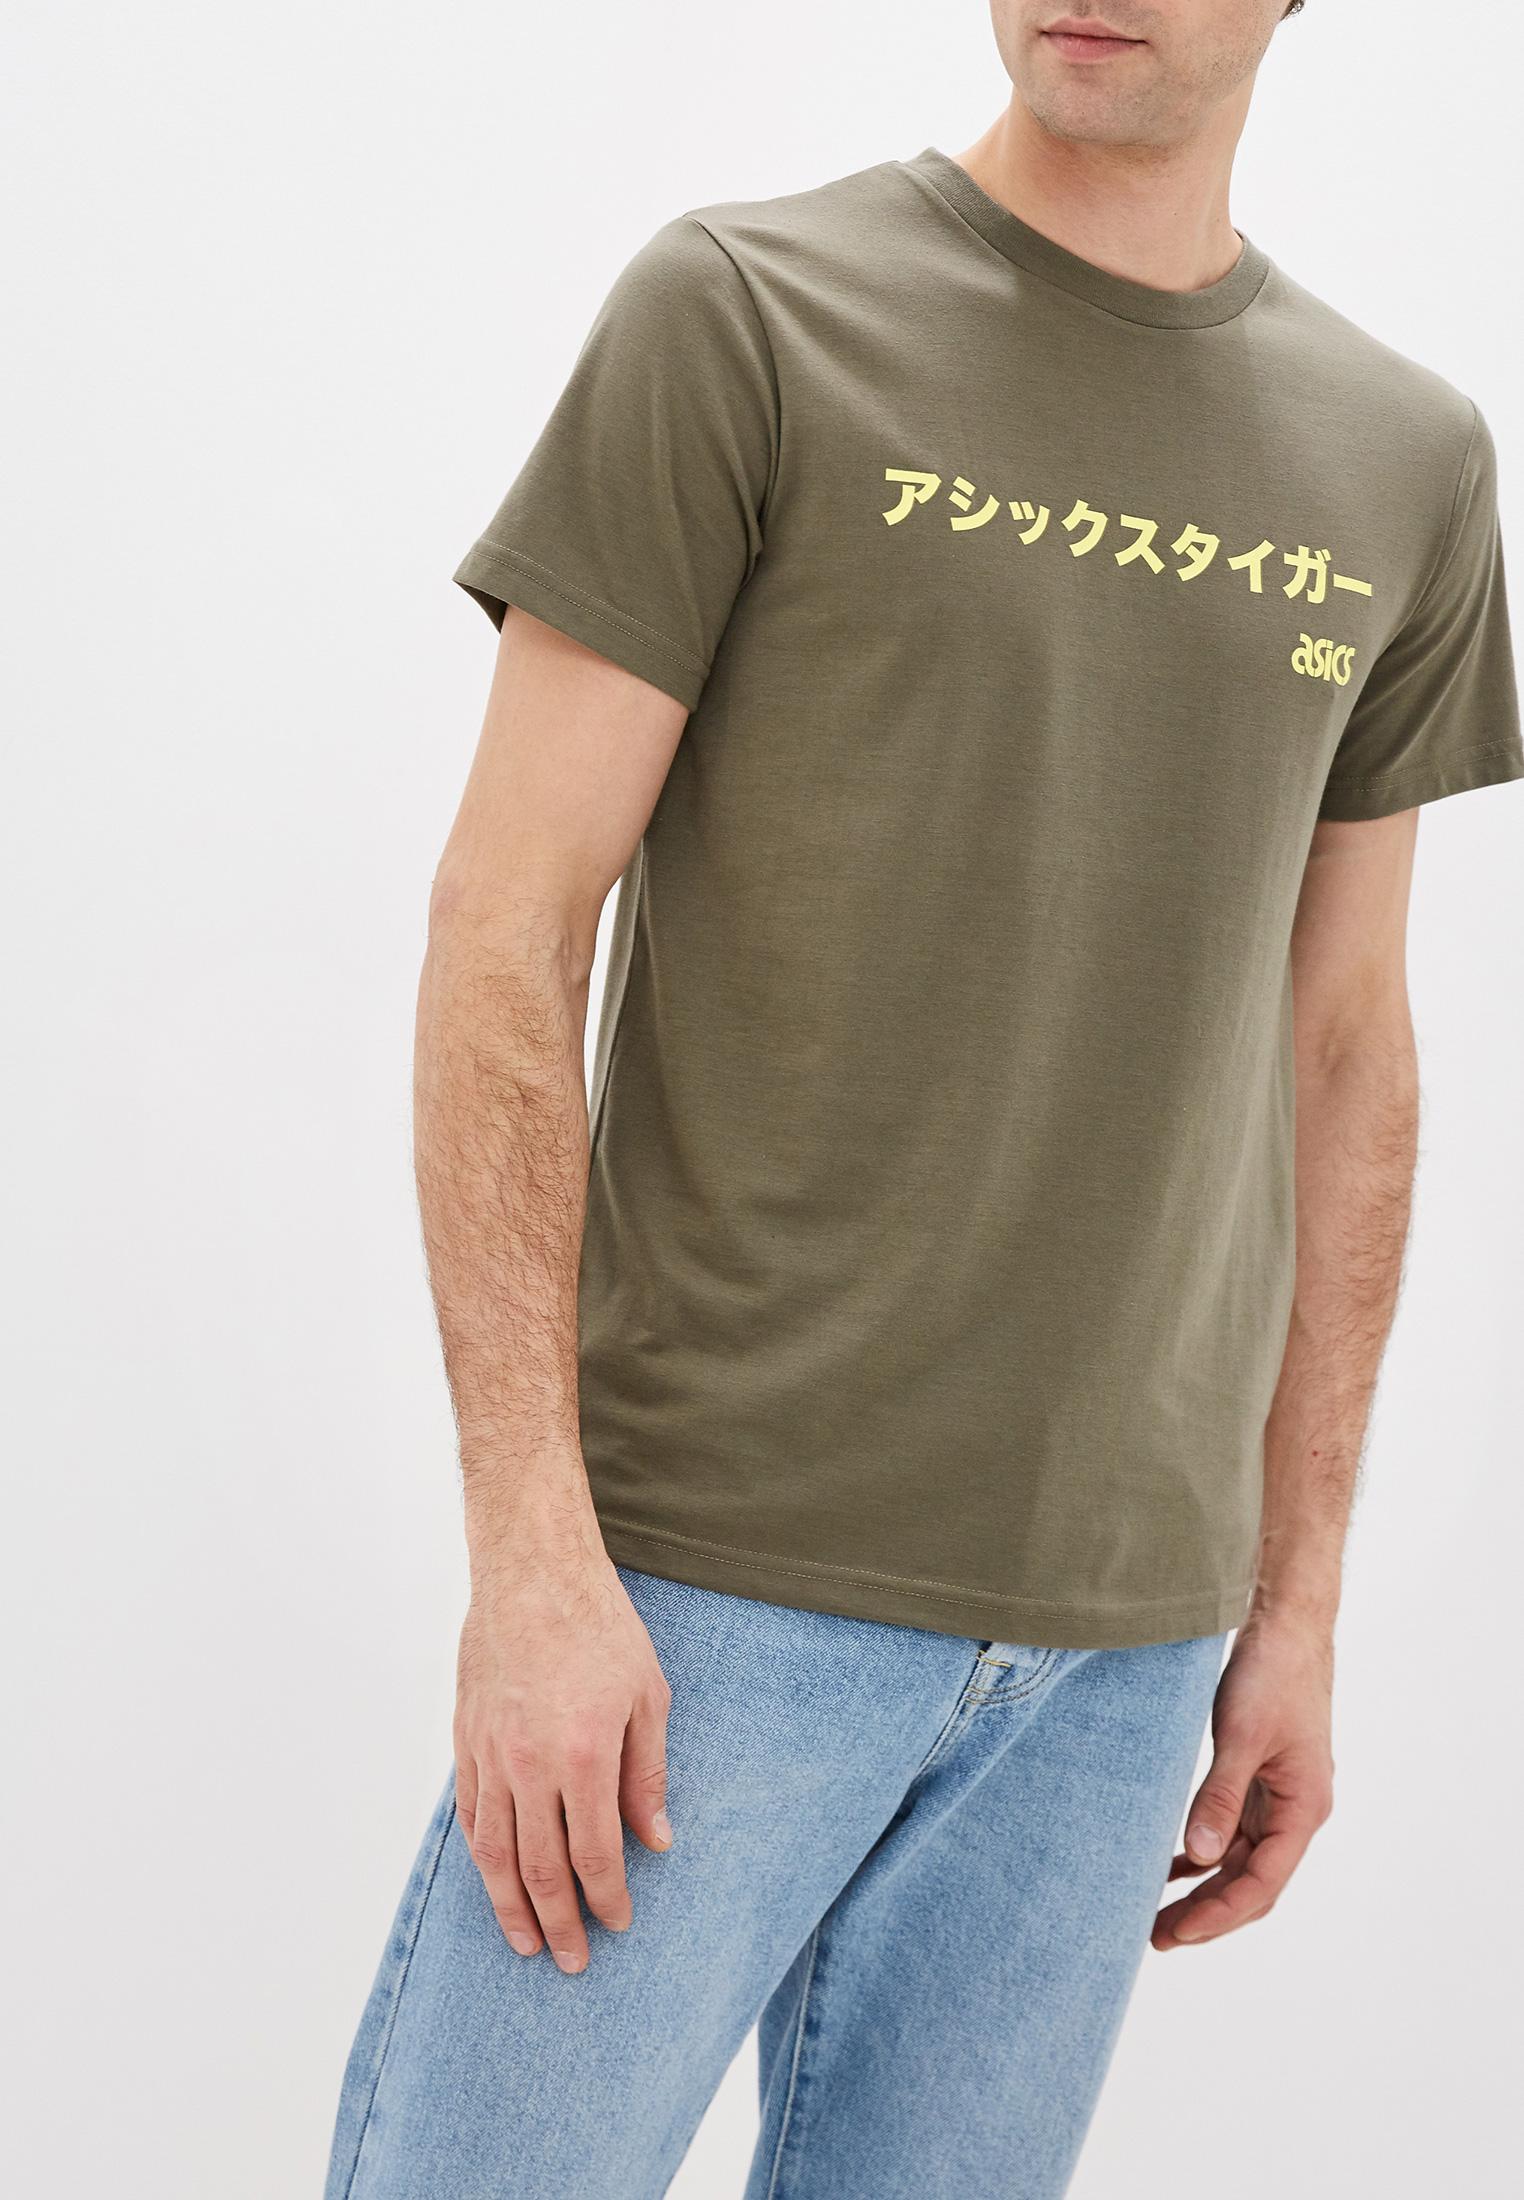 FAMOUS STARS /& STRAPS Akilla-fornia White T-Shirt S-XXXL NEW